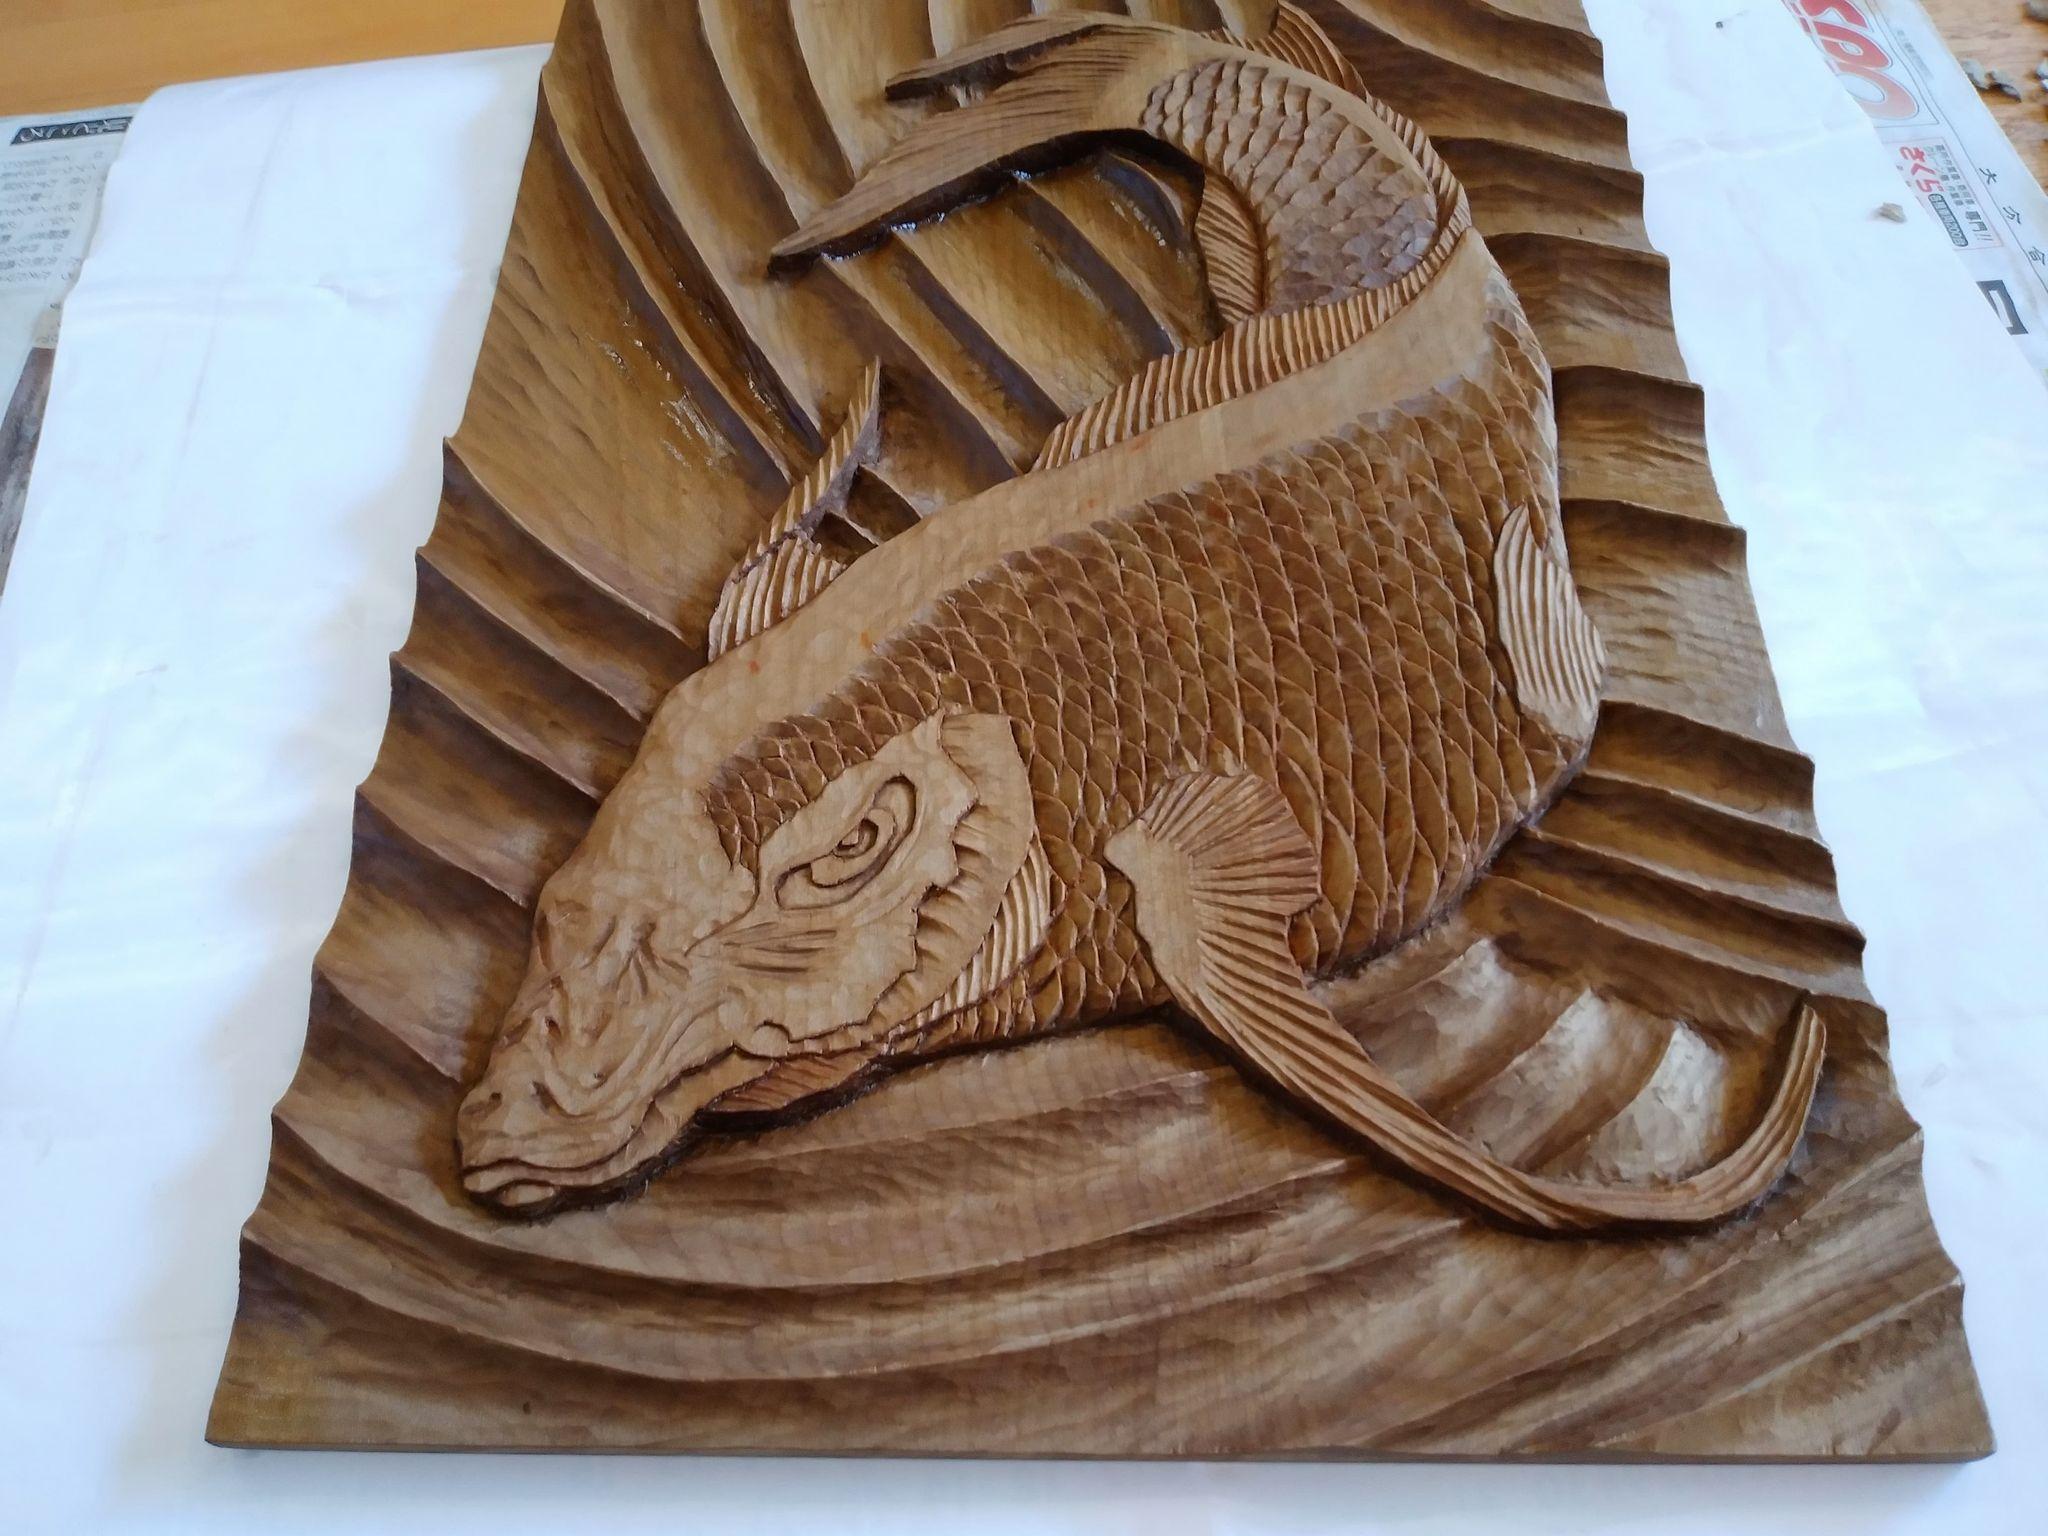 【制作実績】木彫作品『鯉から龍』完成2